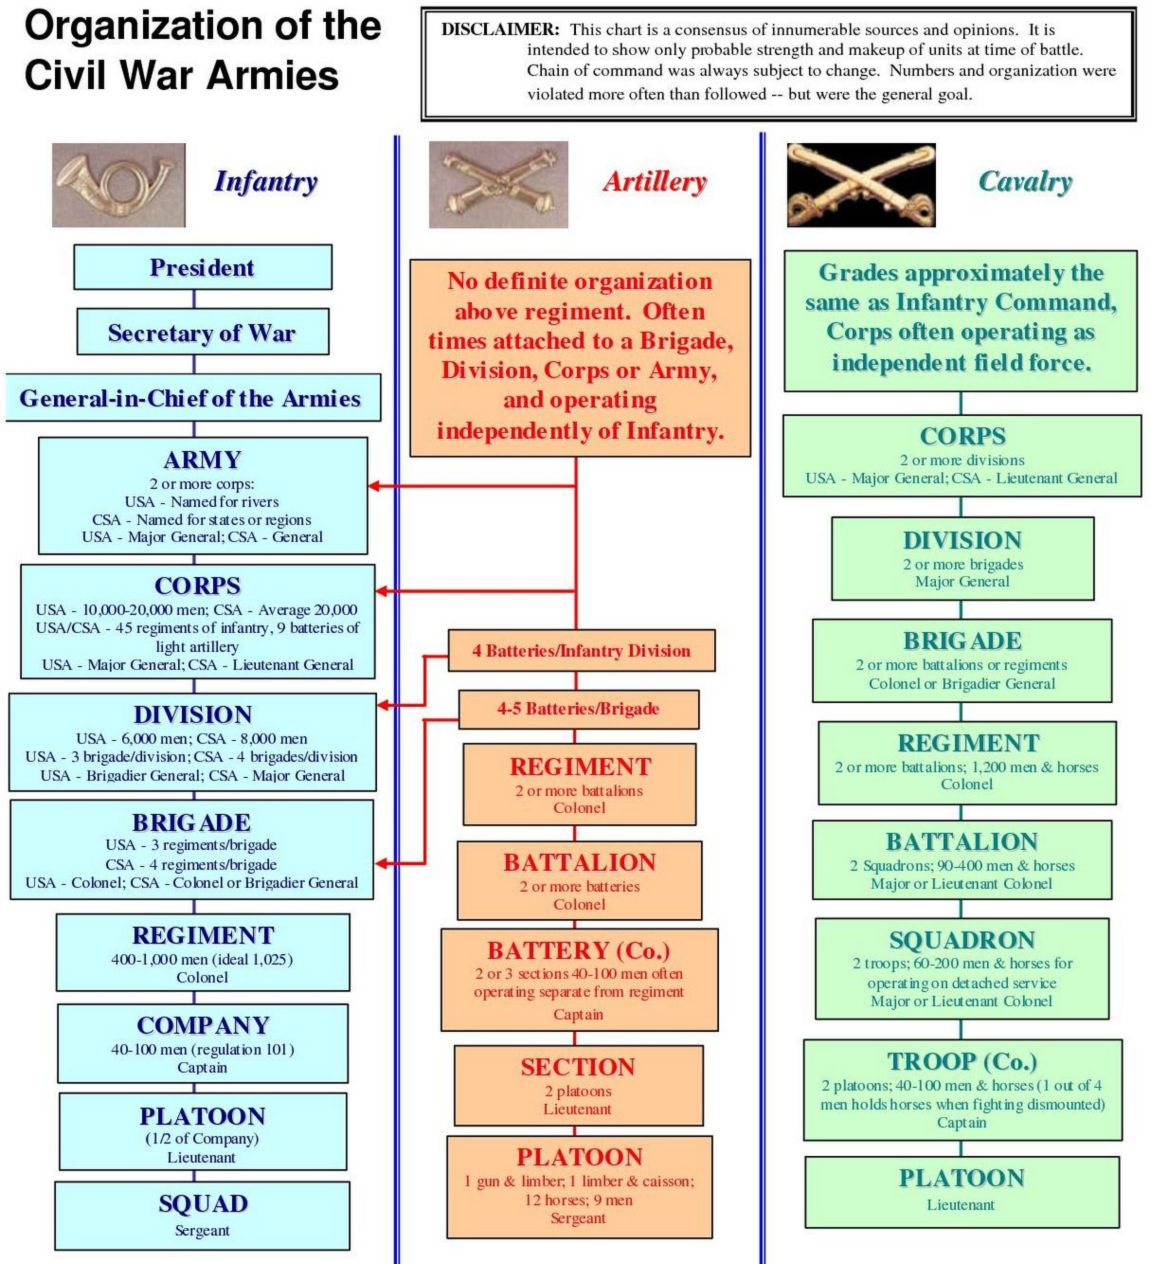 Civil war infantry cavalry artillery army union confederate organization of union and confederate armiesg biocorpaavc Choice Image